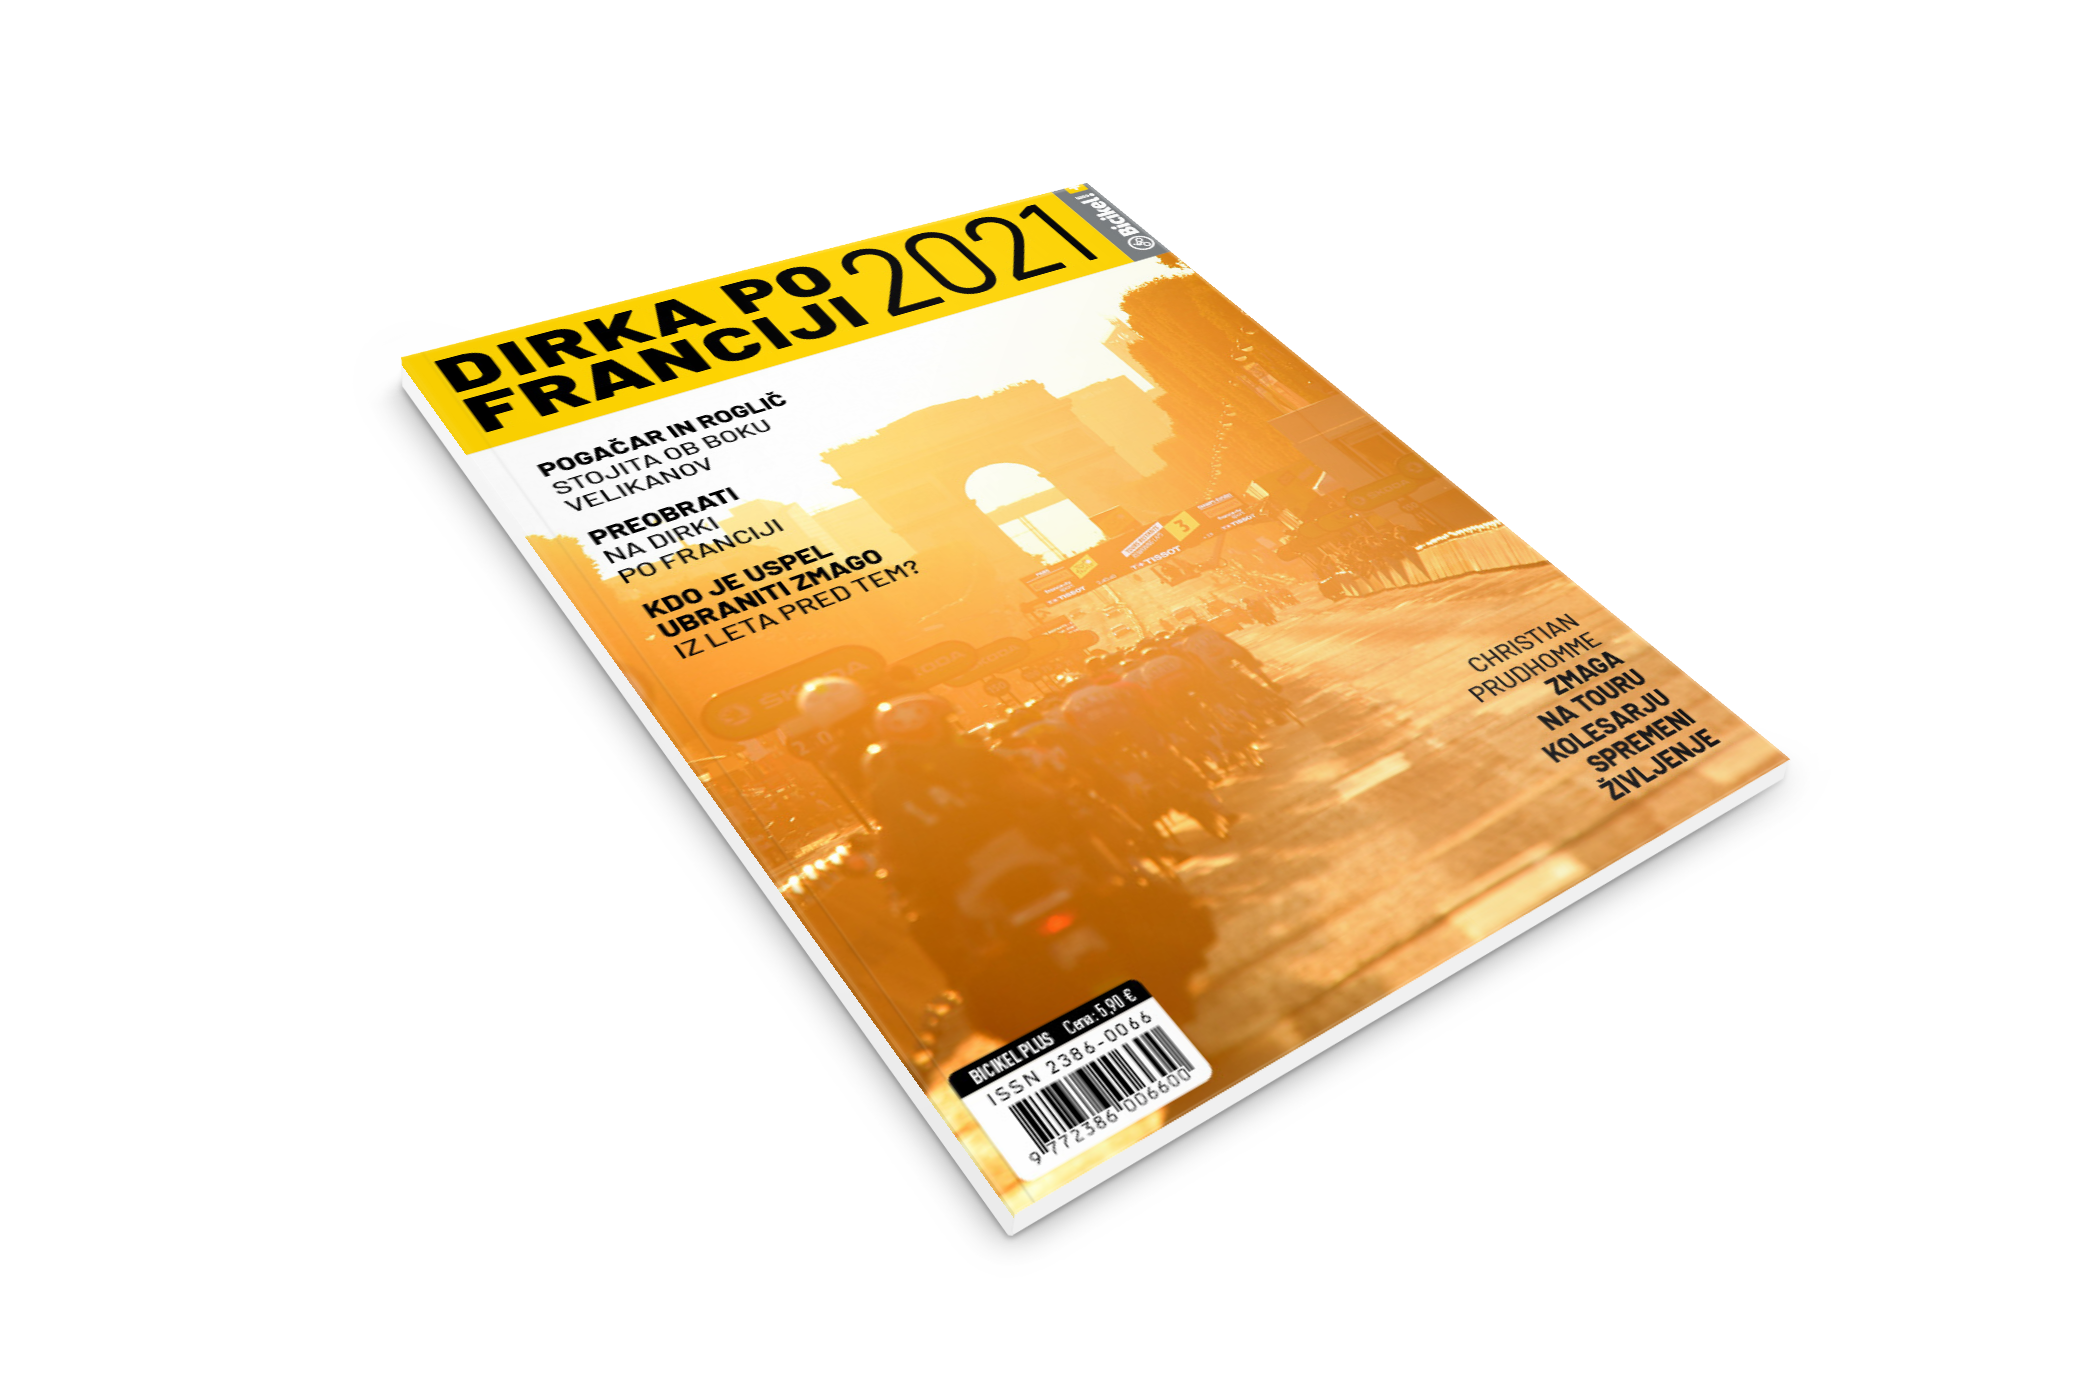 Junaki - revija Bicikel.com plus